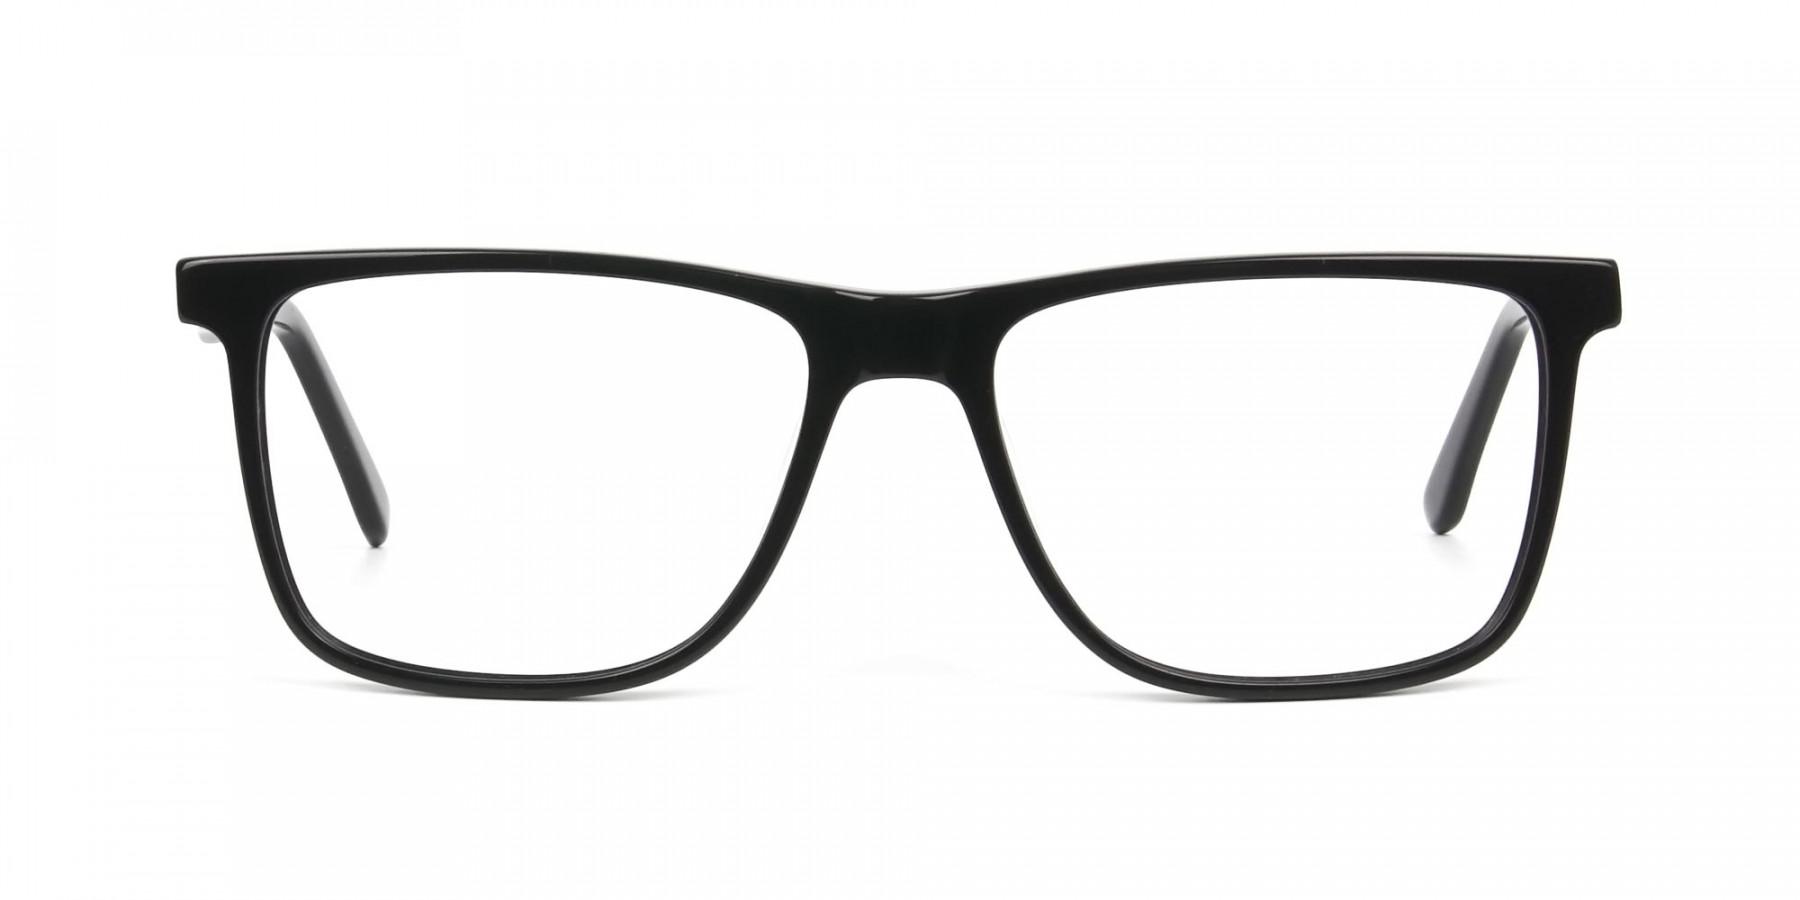 Dark Grey Acetate Glasses in Rectangular - 1